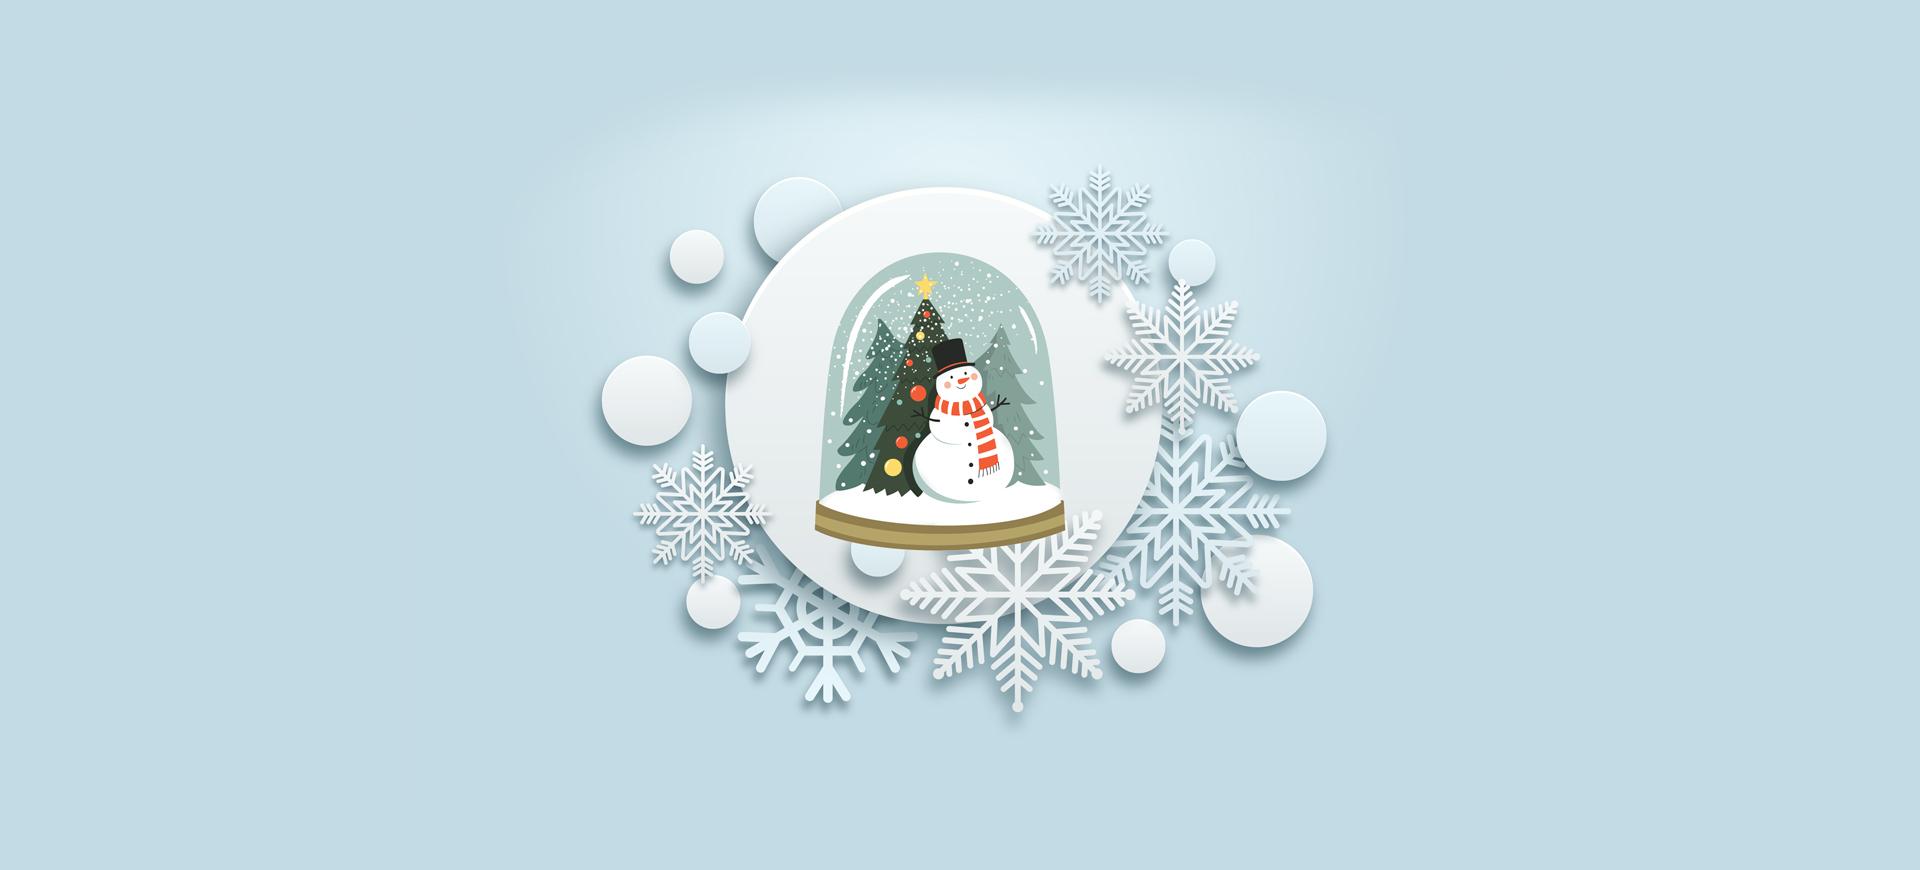 A Crafty Holiday Recipe: DIY Snow Globes